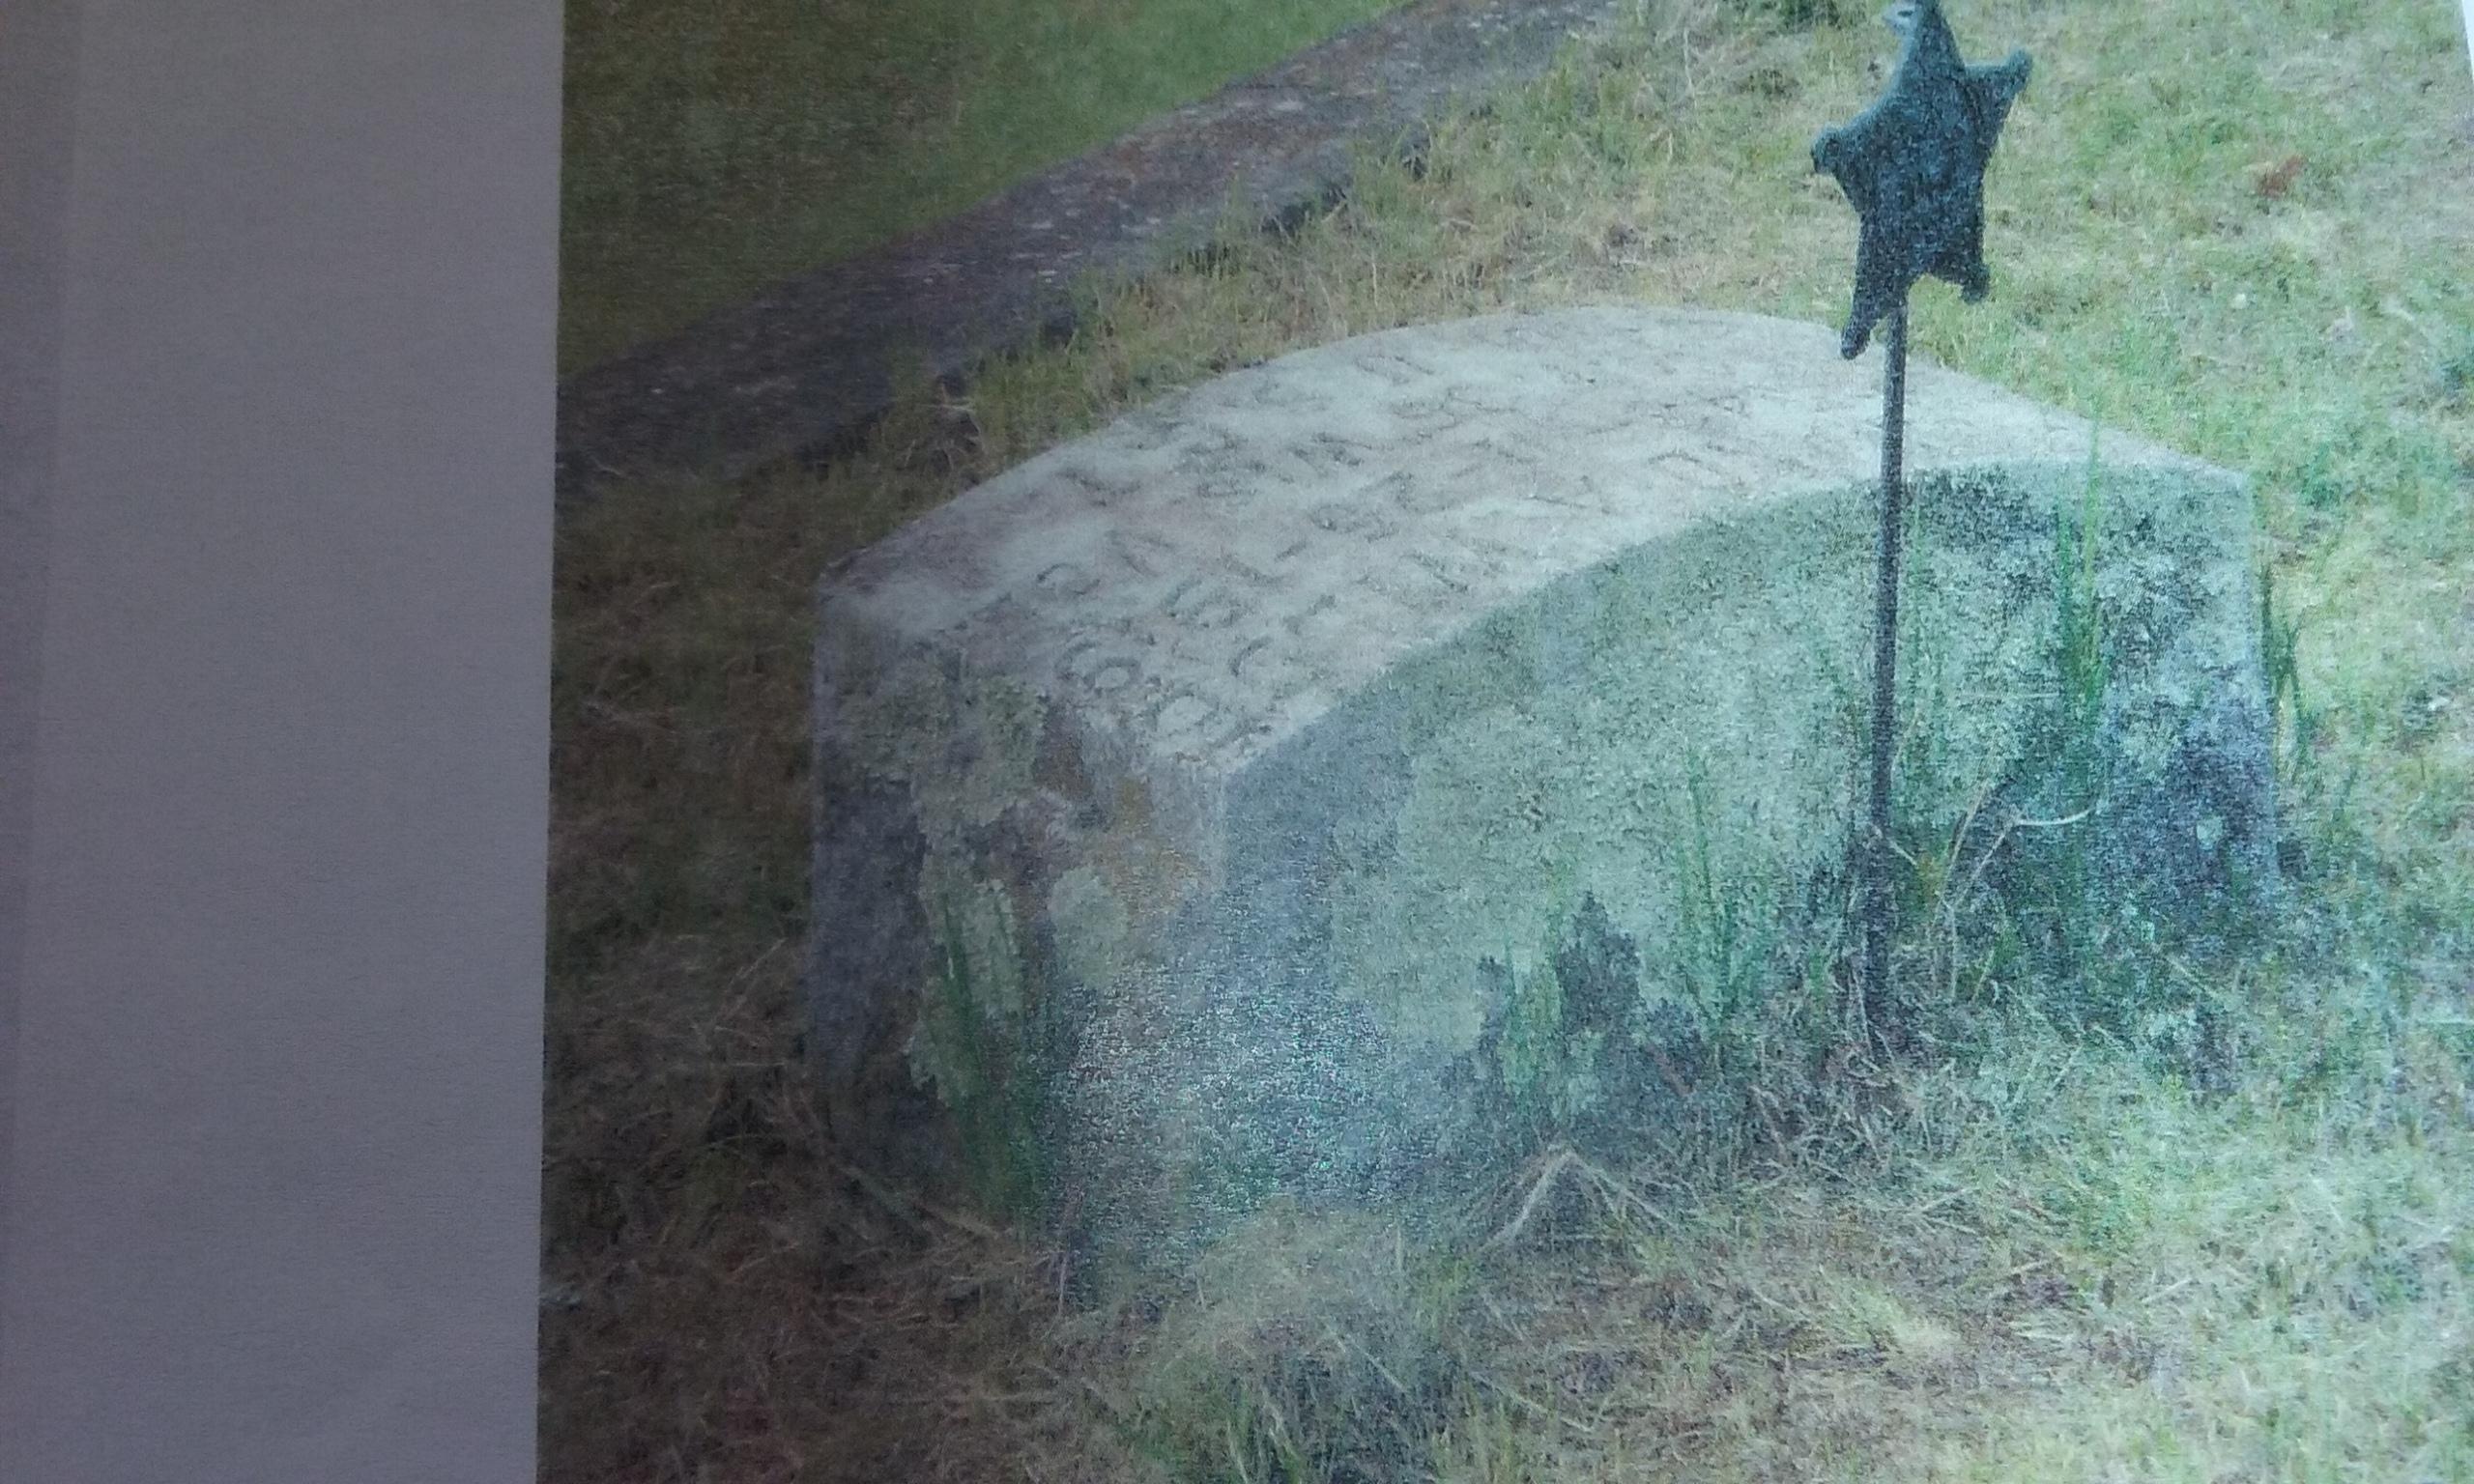 Cemetery Restoration - City of Princeton